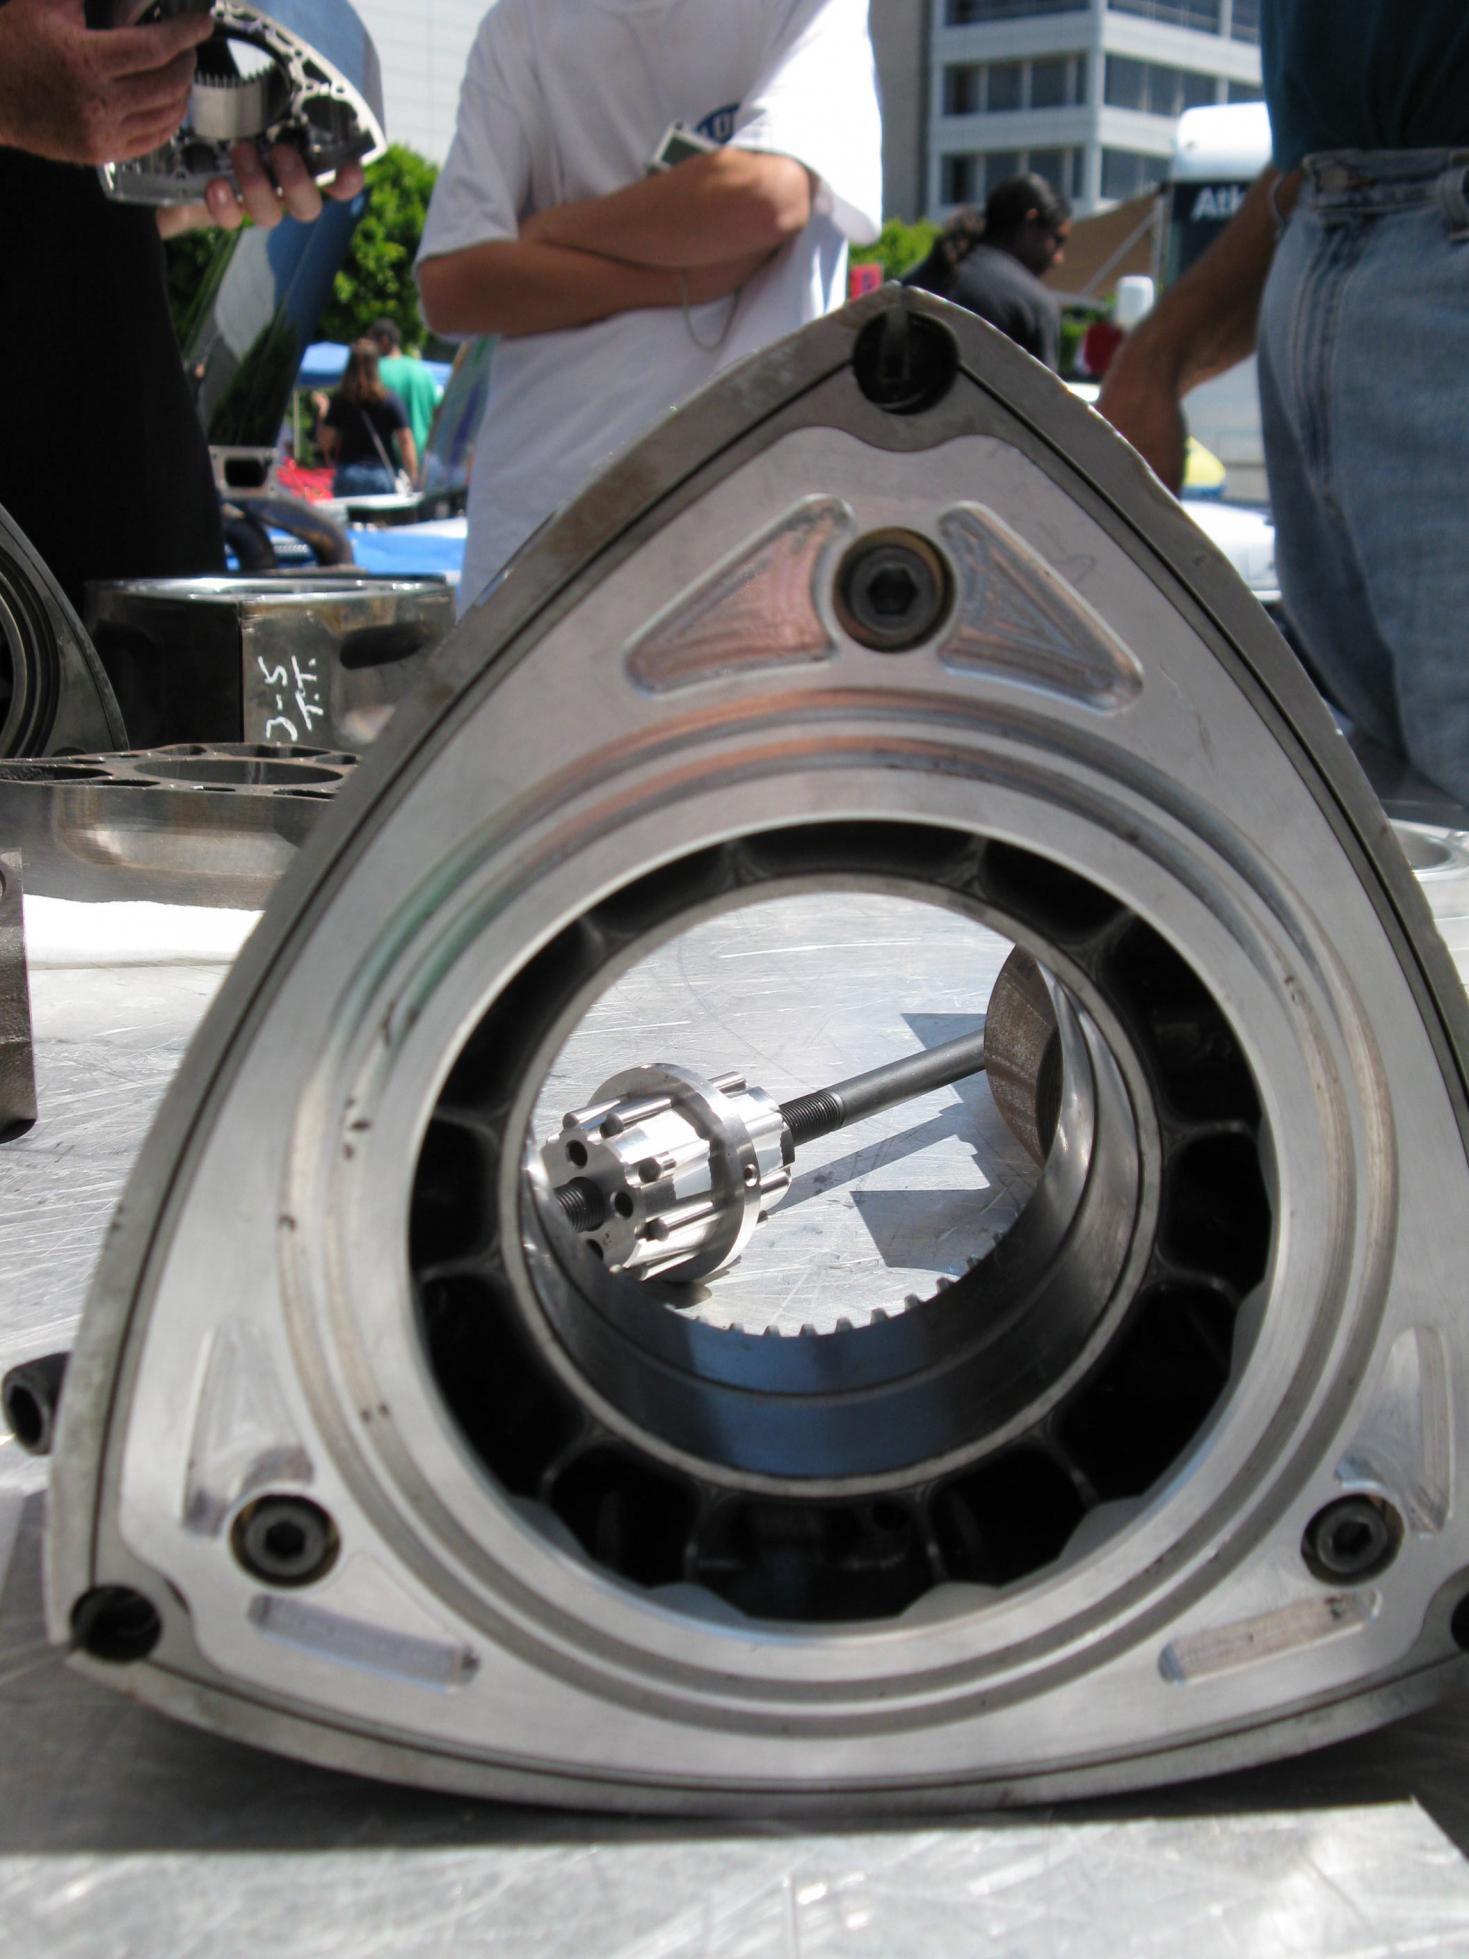 Billet Rotors From Mazdatrix Mazda RX7 Forum